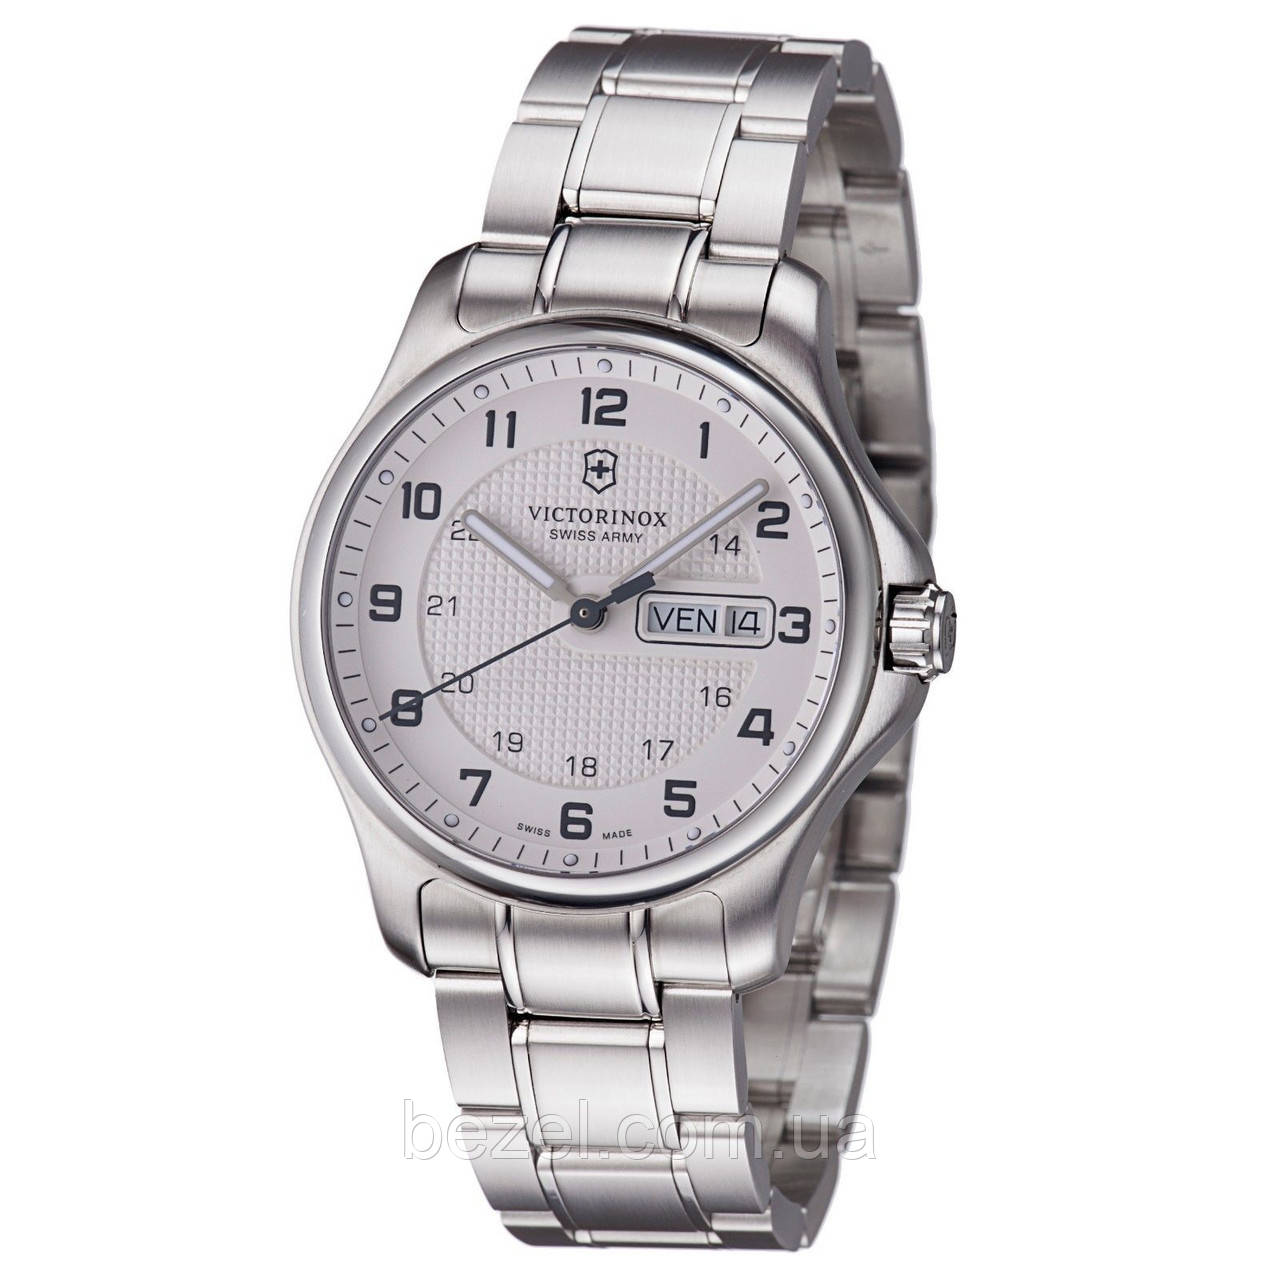 Мужские часы Victorinox Swiss Army 241551